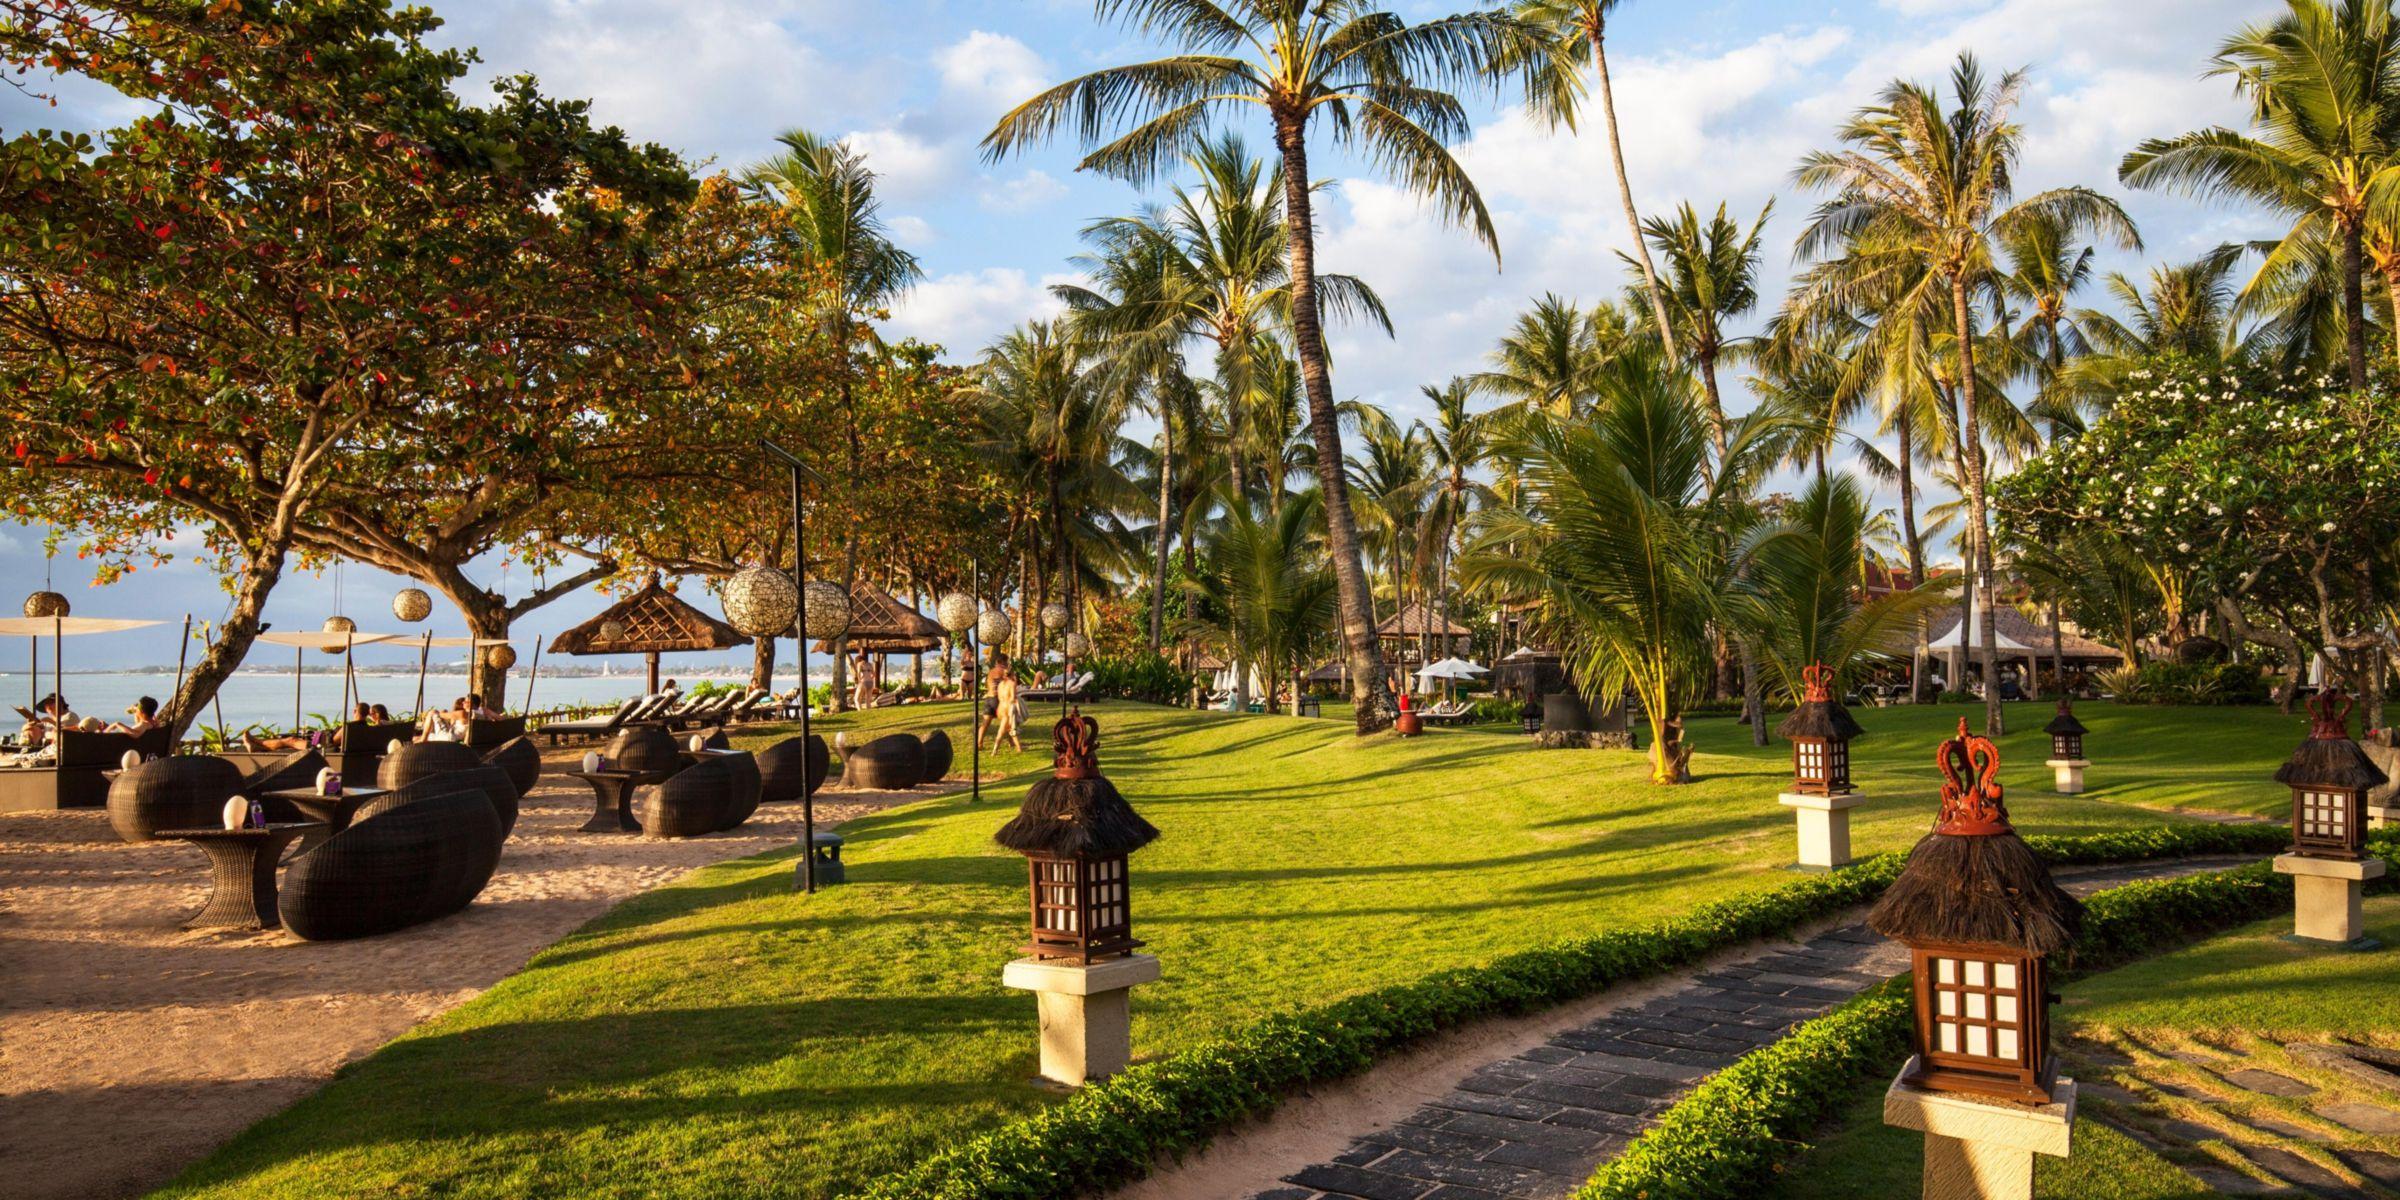 InterContinental Bali Resort - Bali